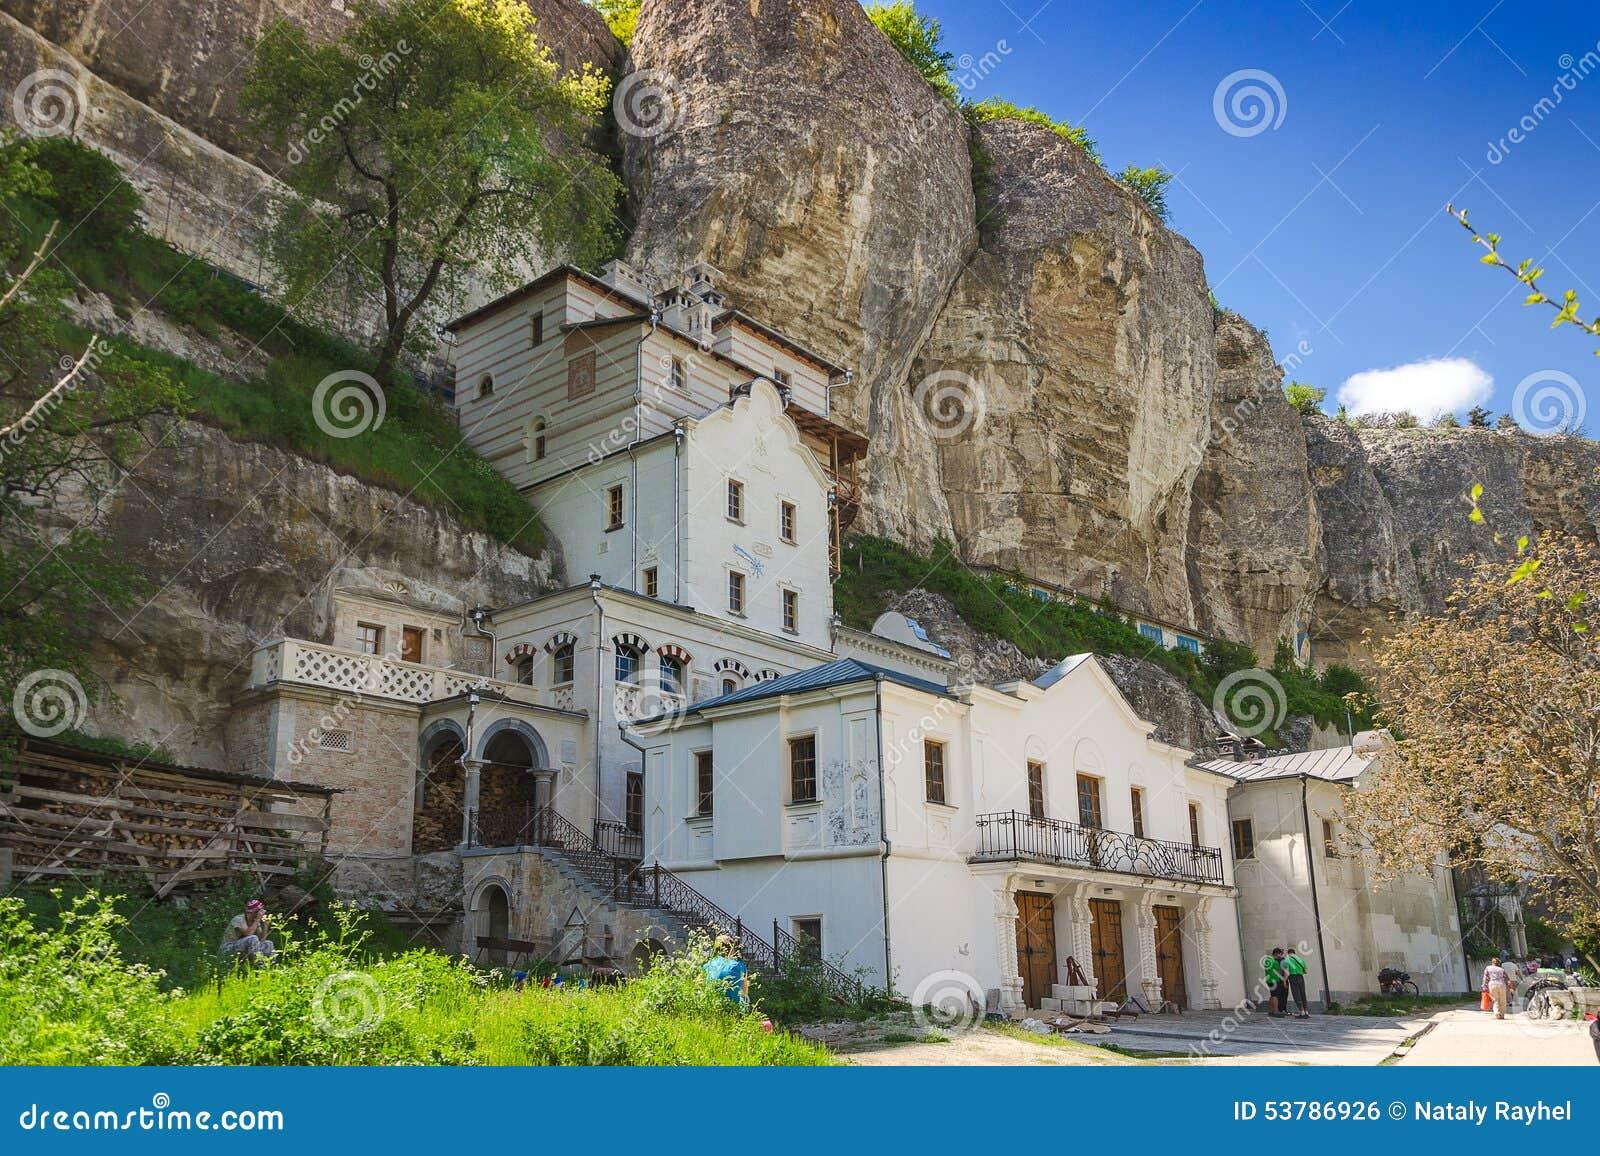 Monaster w górach